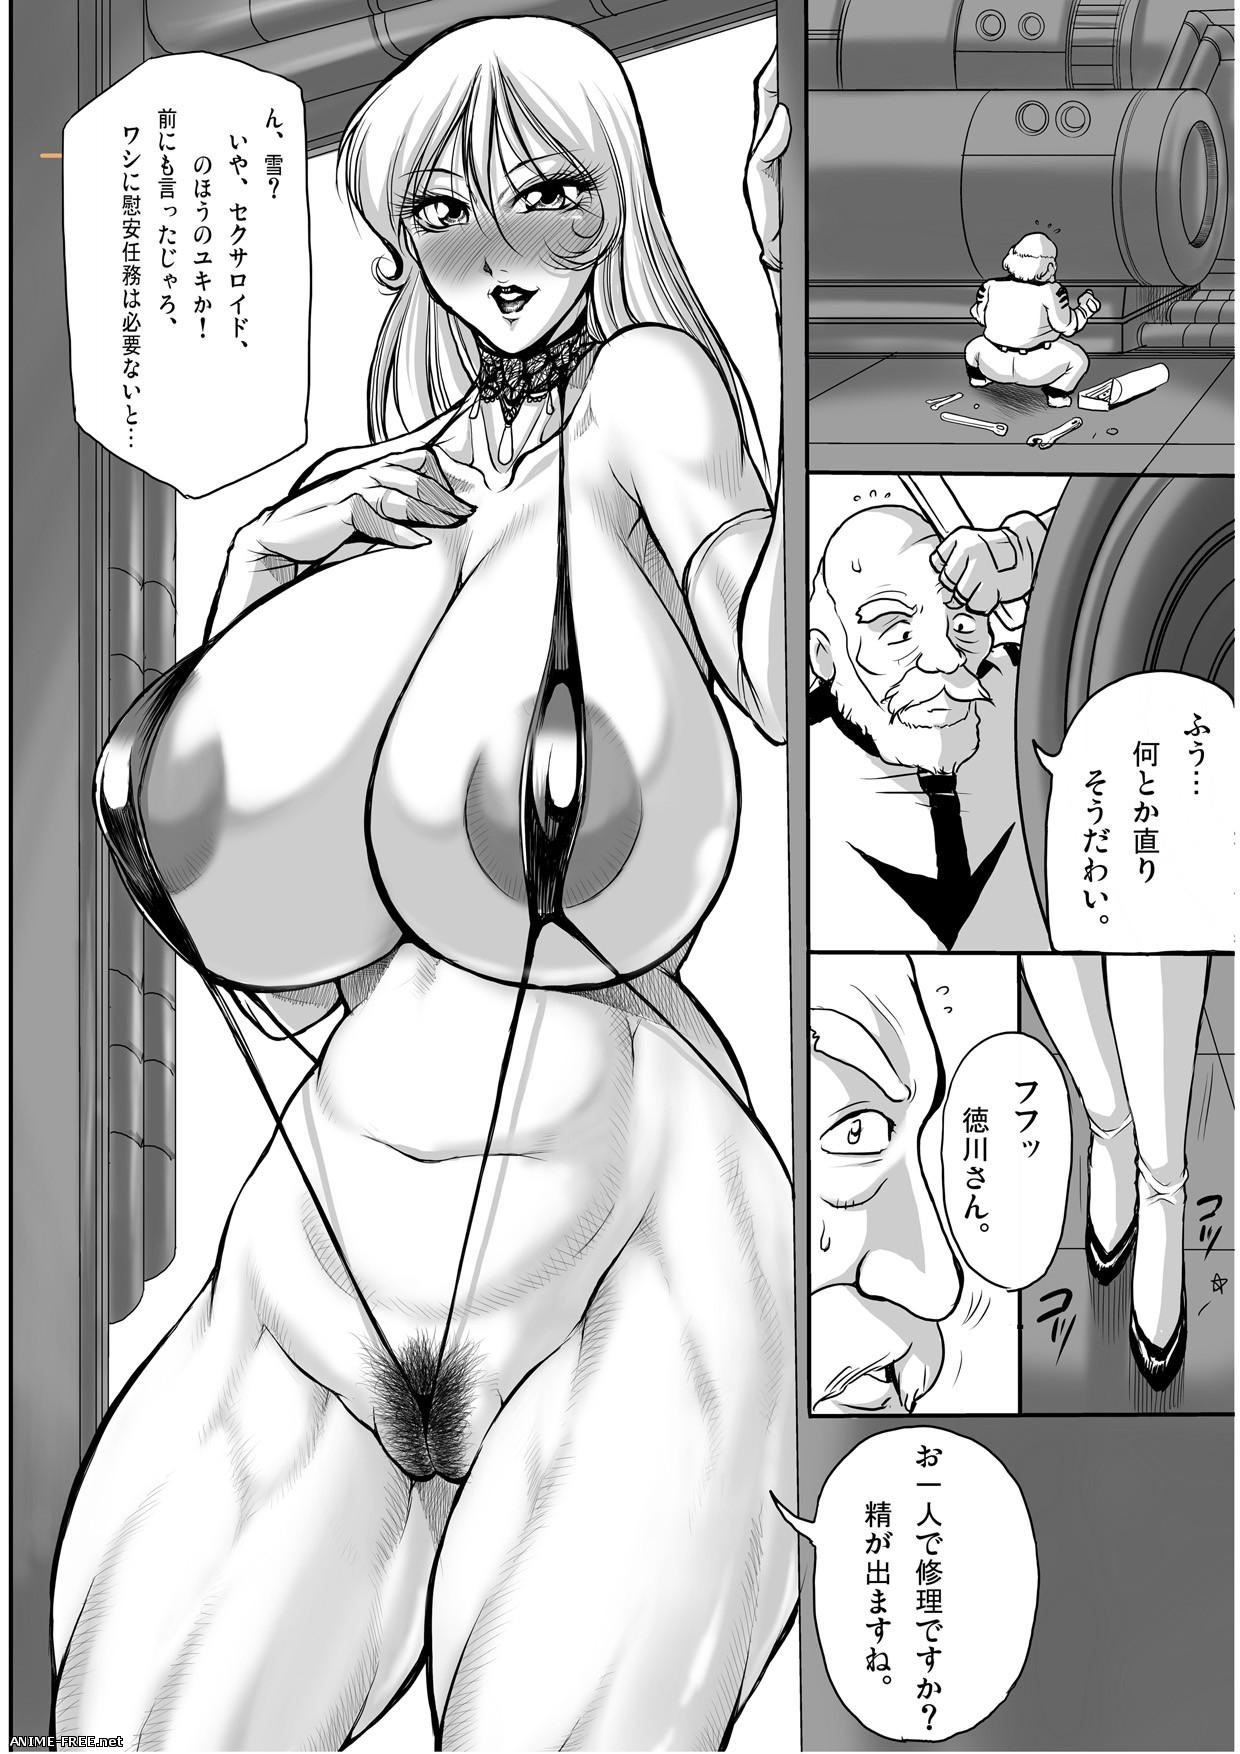 Akane Syuhei — Коллекция хентай манги [2006-2015] [Сen] [RUS,ENG,JAP] Manga Hentai